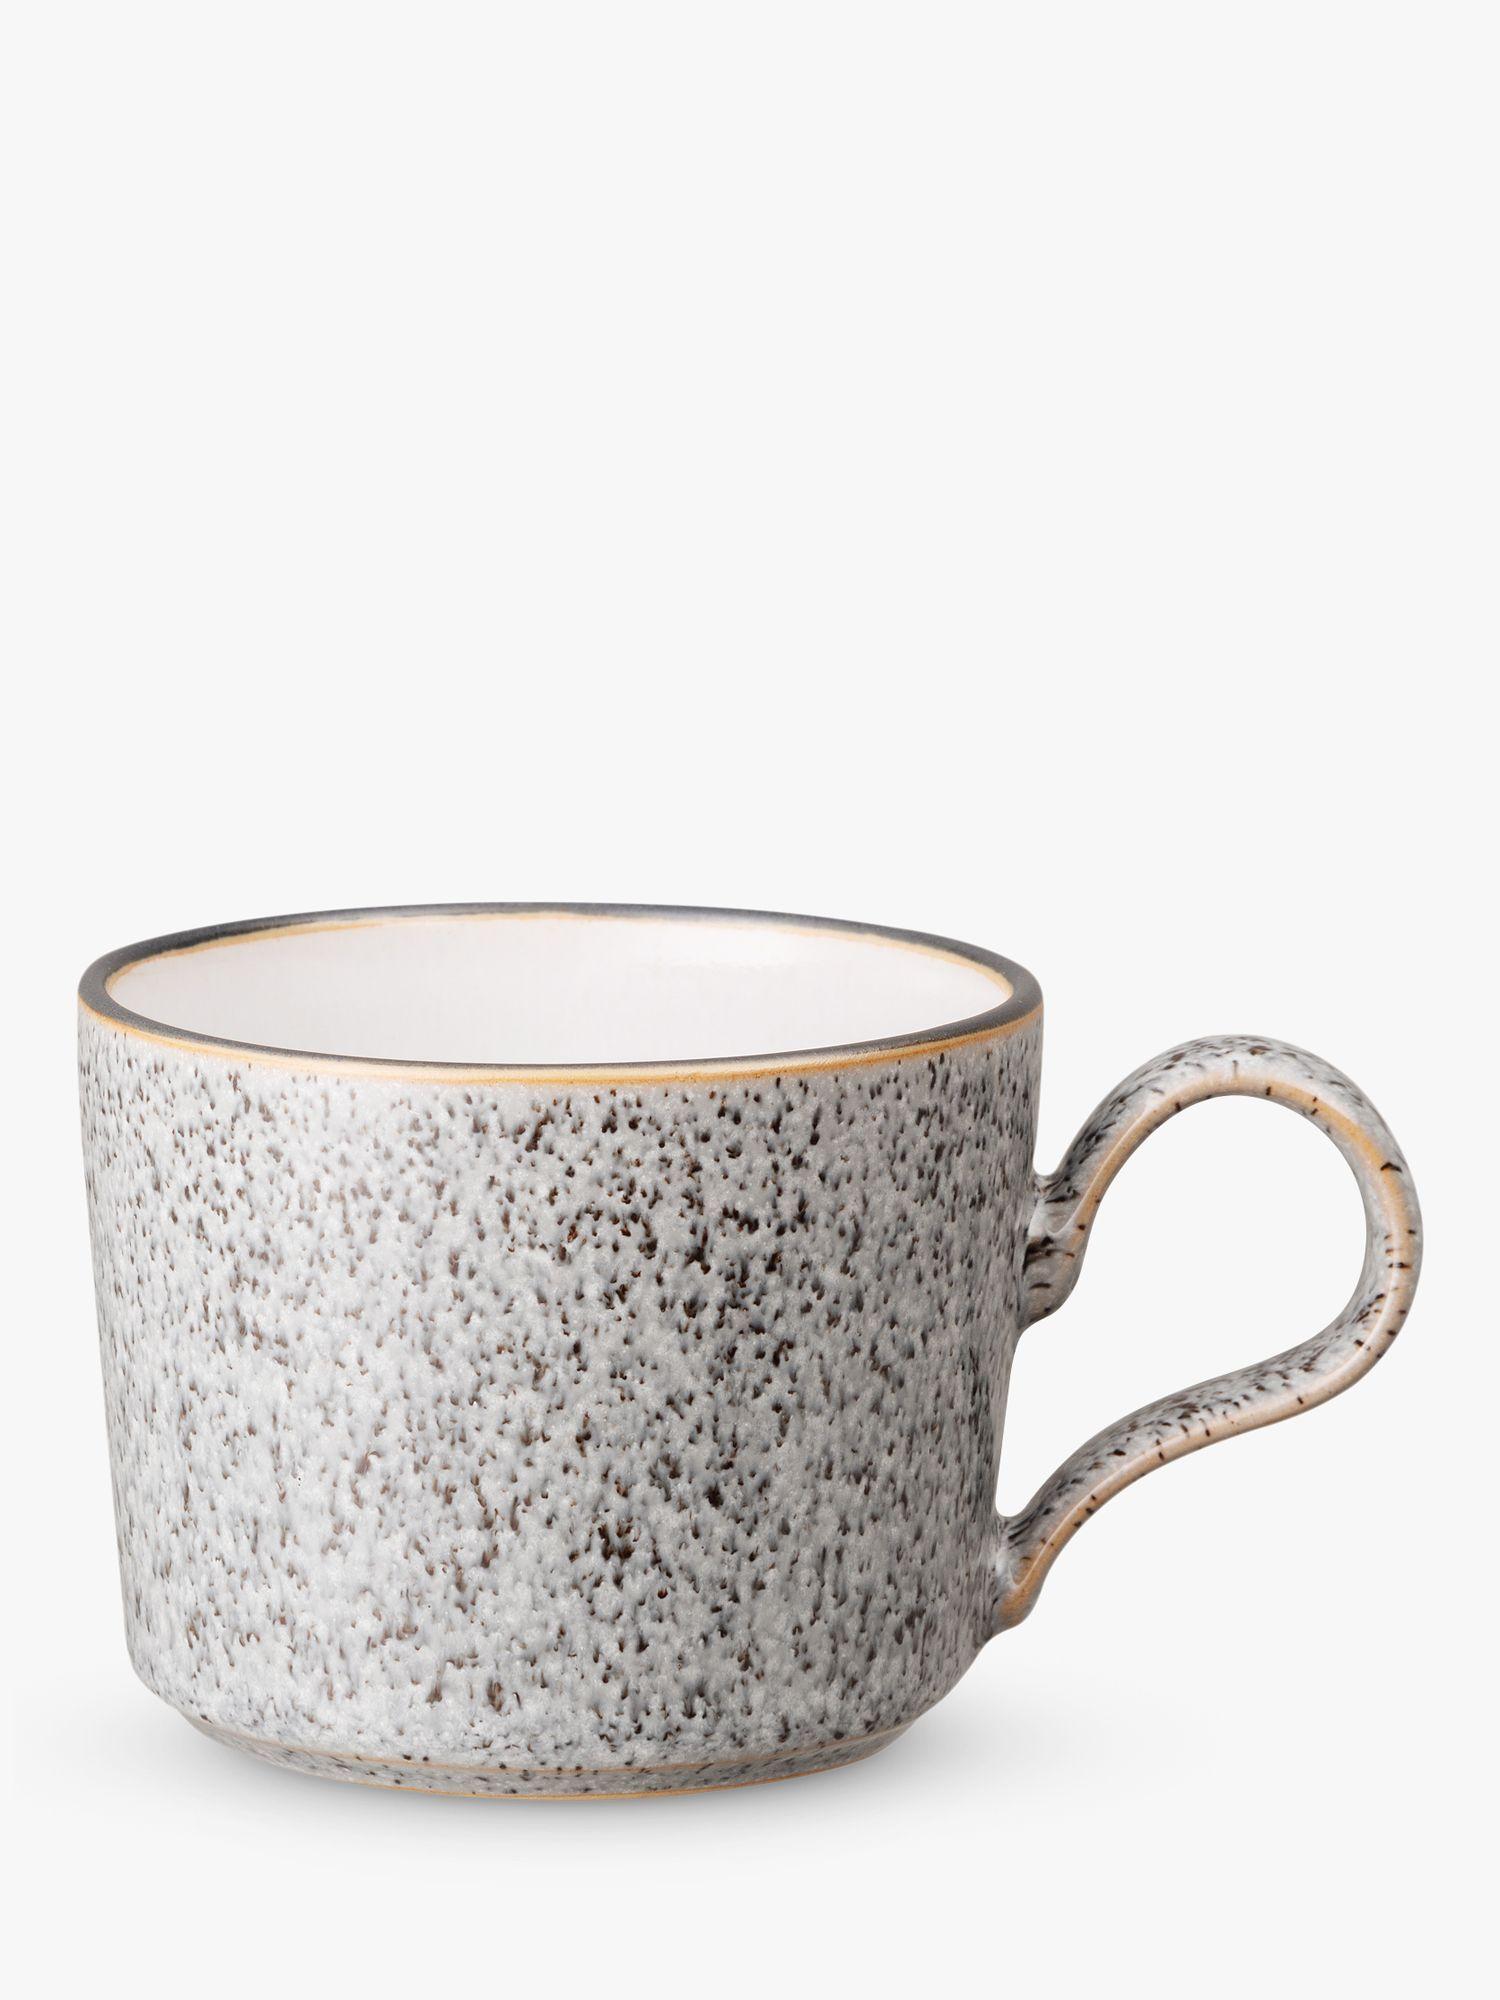 Denby Studio Grey Tea Coffee Cups Set Of 2 260ml In 2020 Grey Tea Coffee Tea Coffee Cups